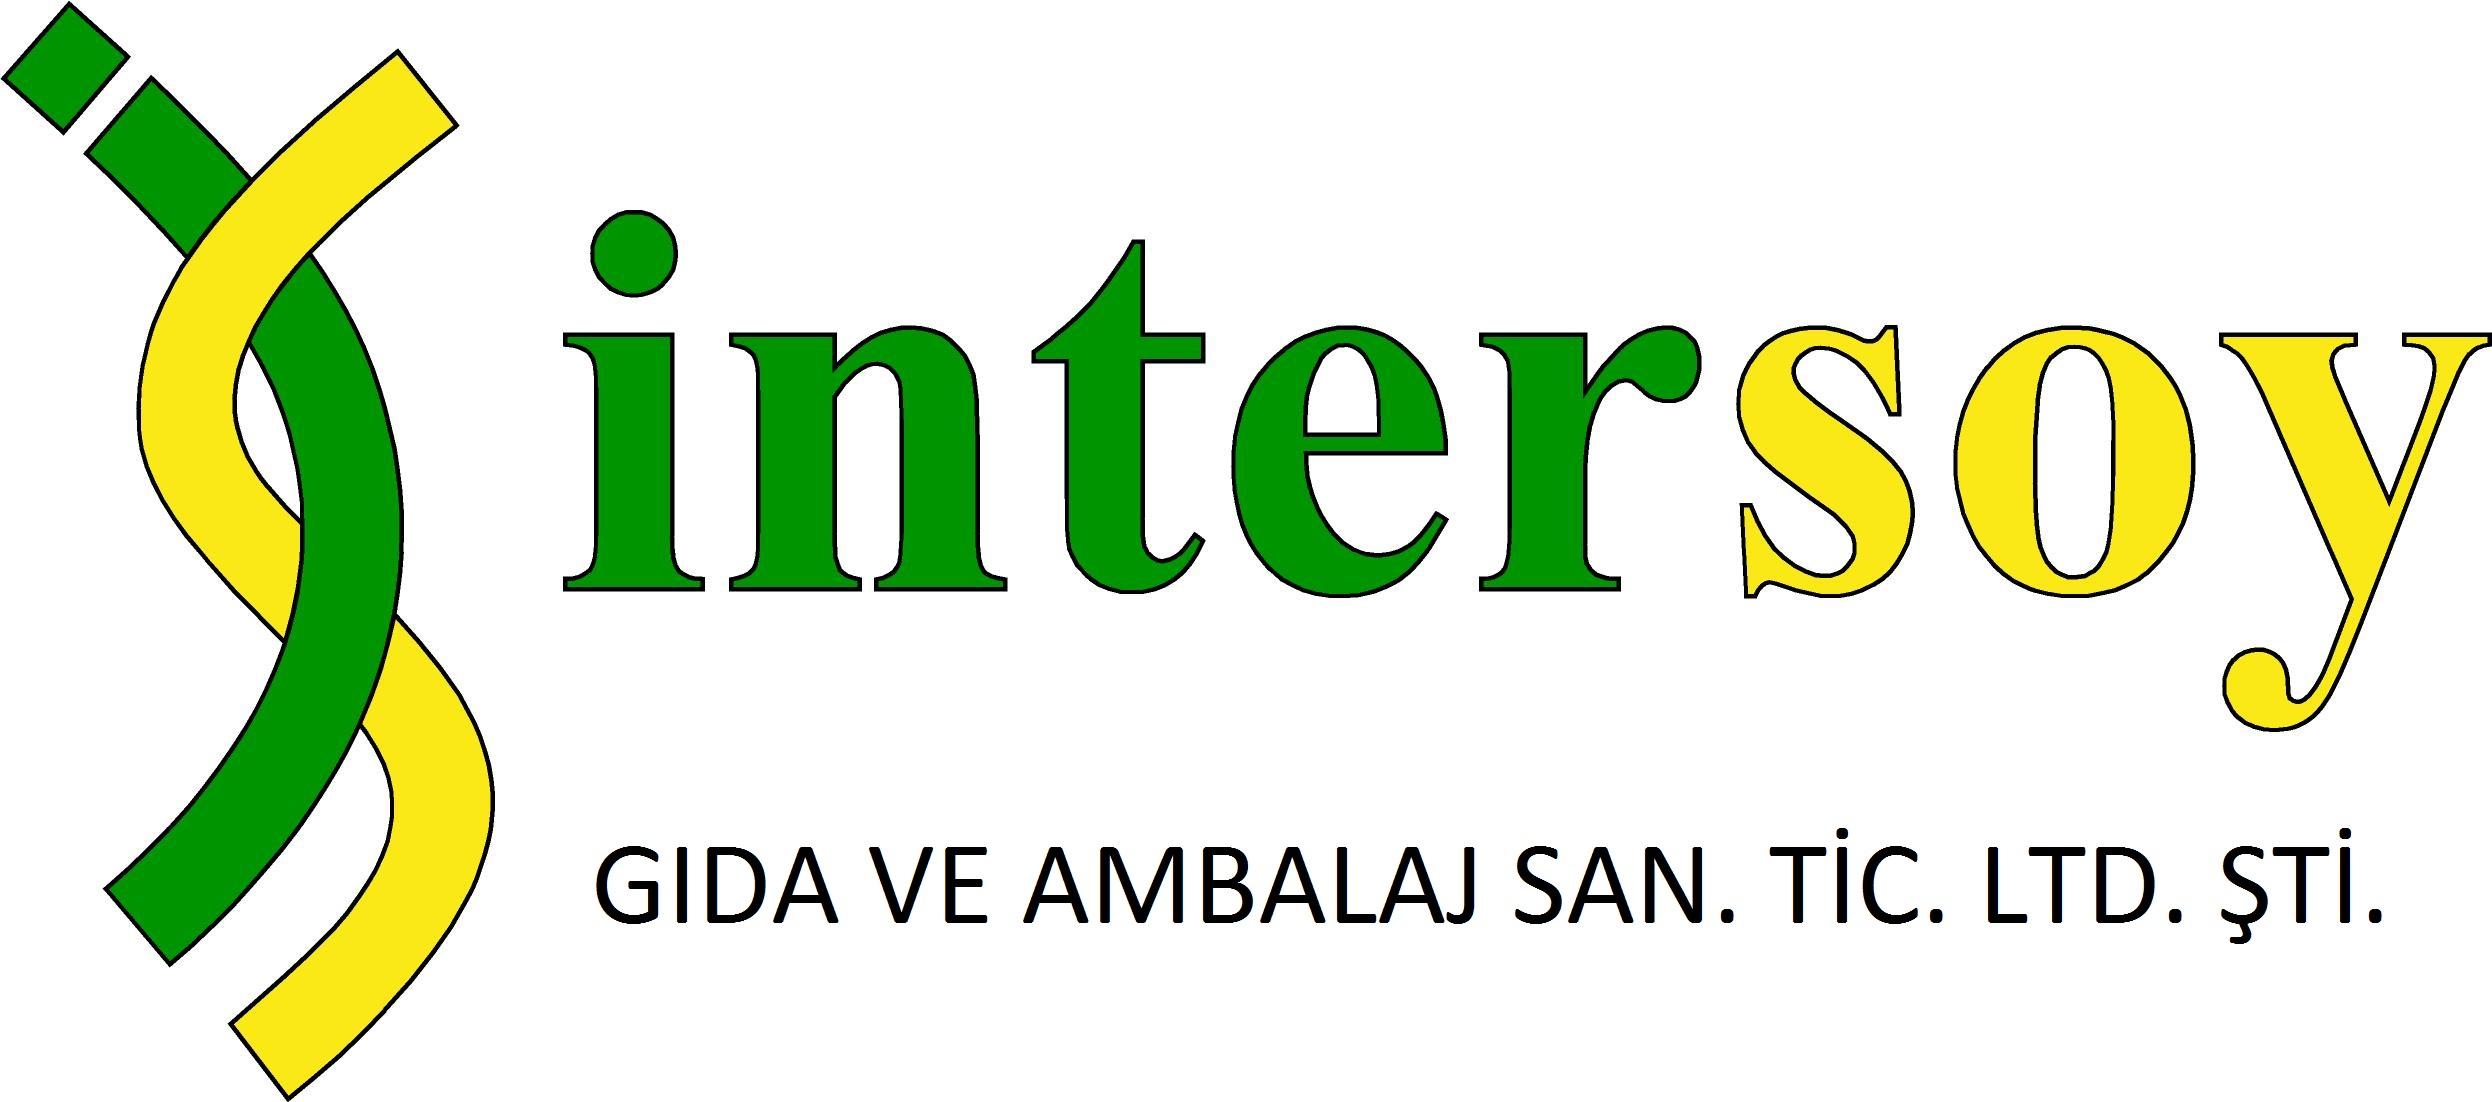 INTERSOY GIDA VE AMBALAJ SAN. TIC. LTD. STI.